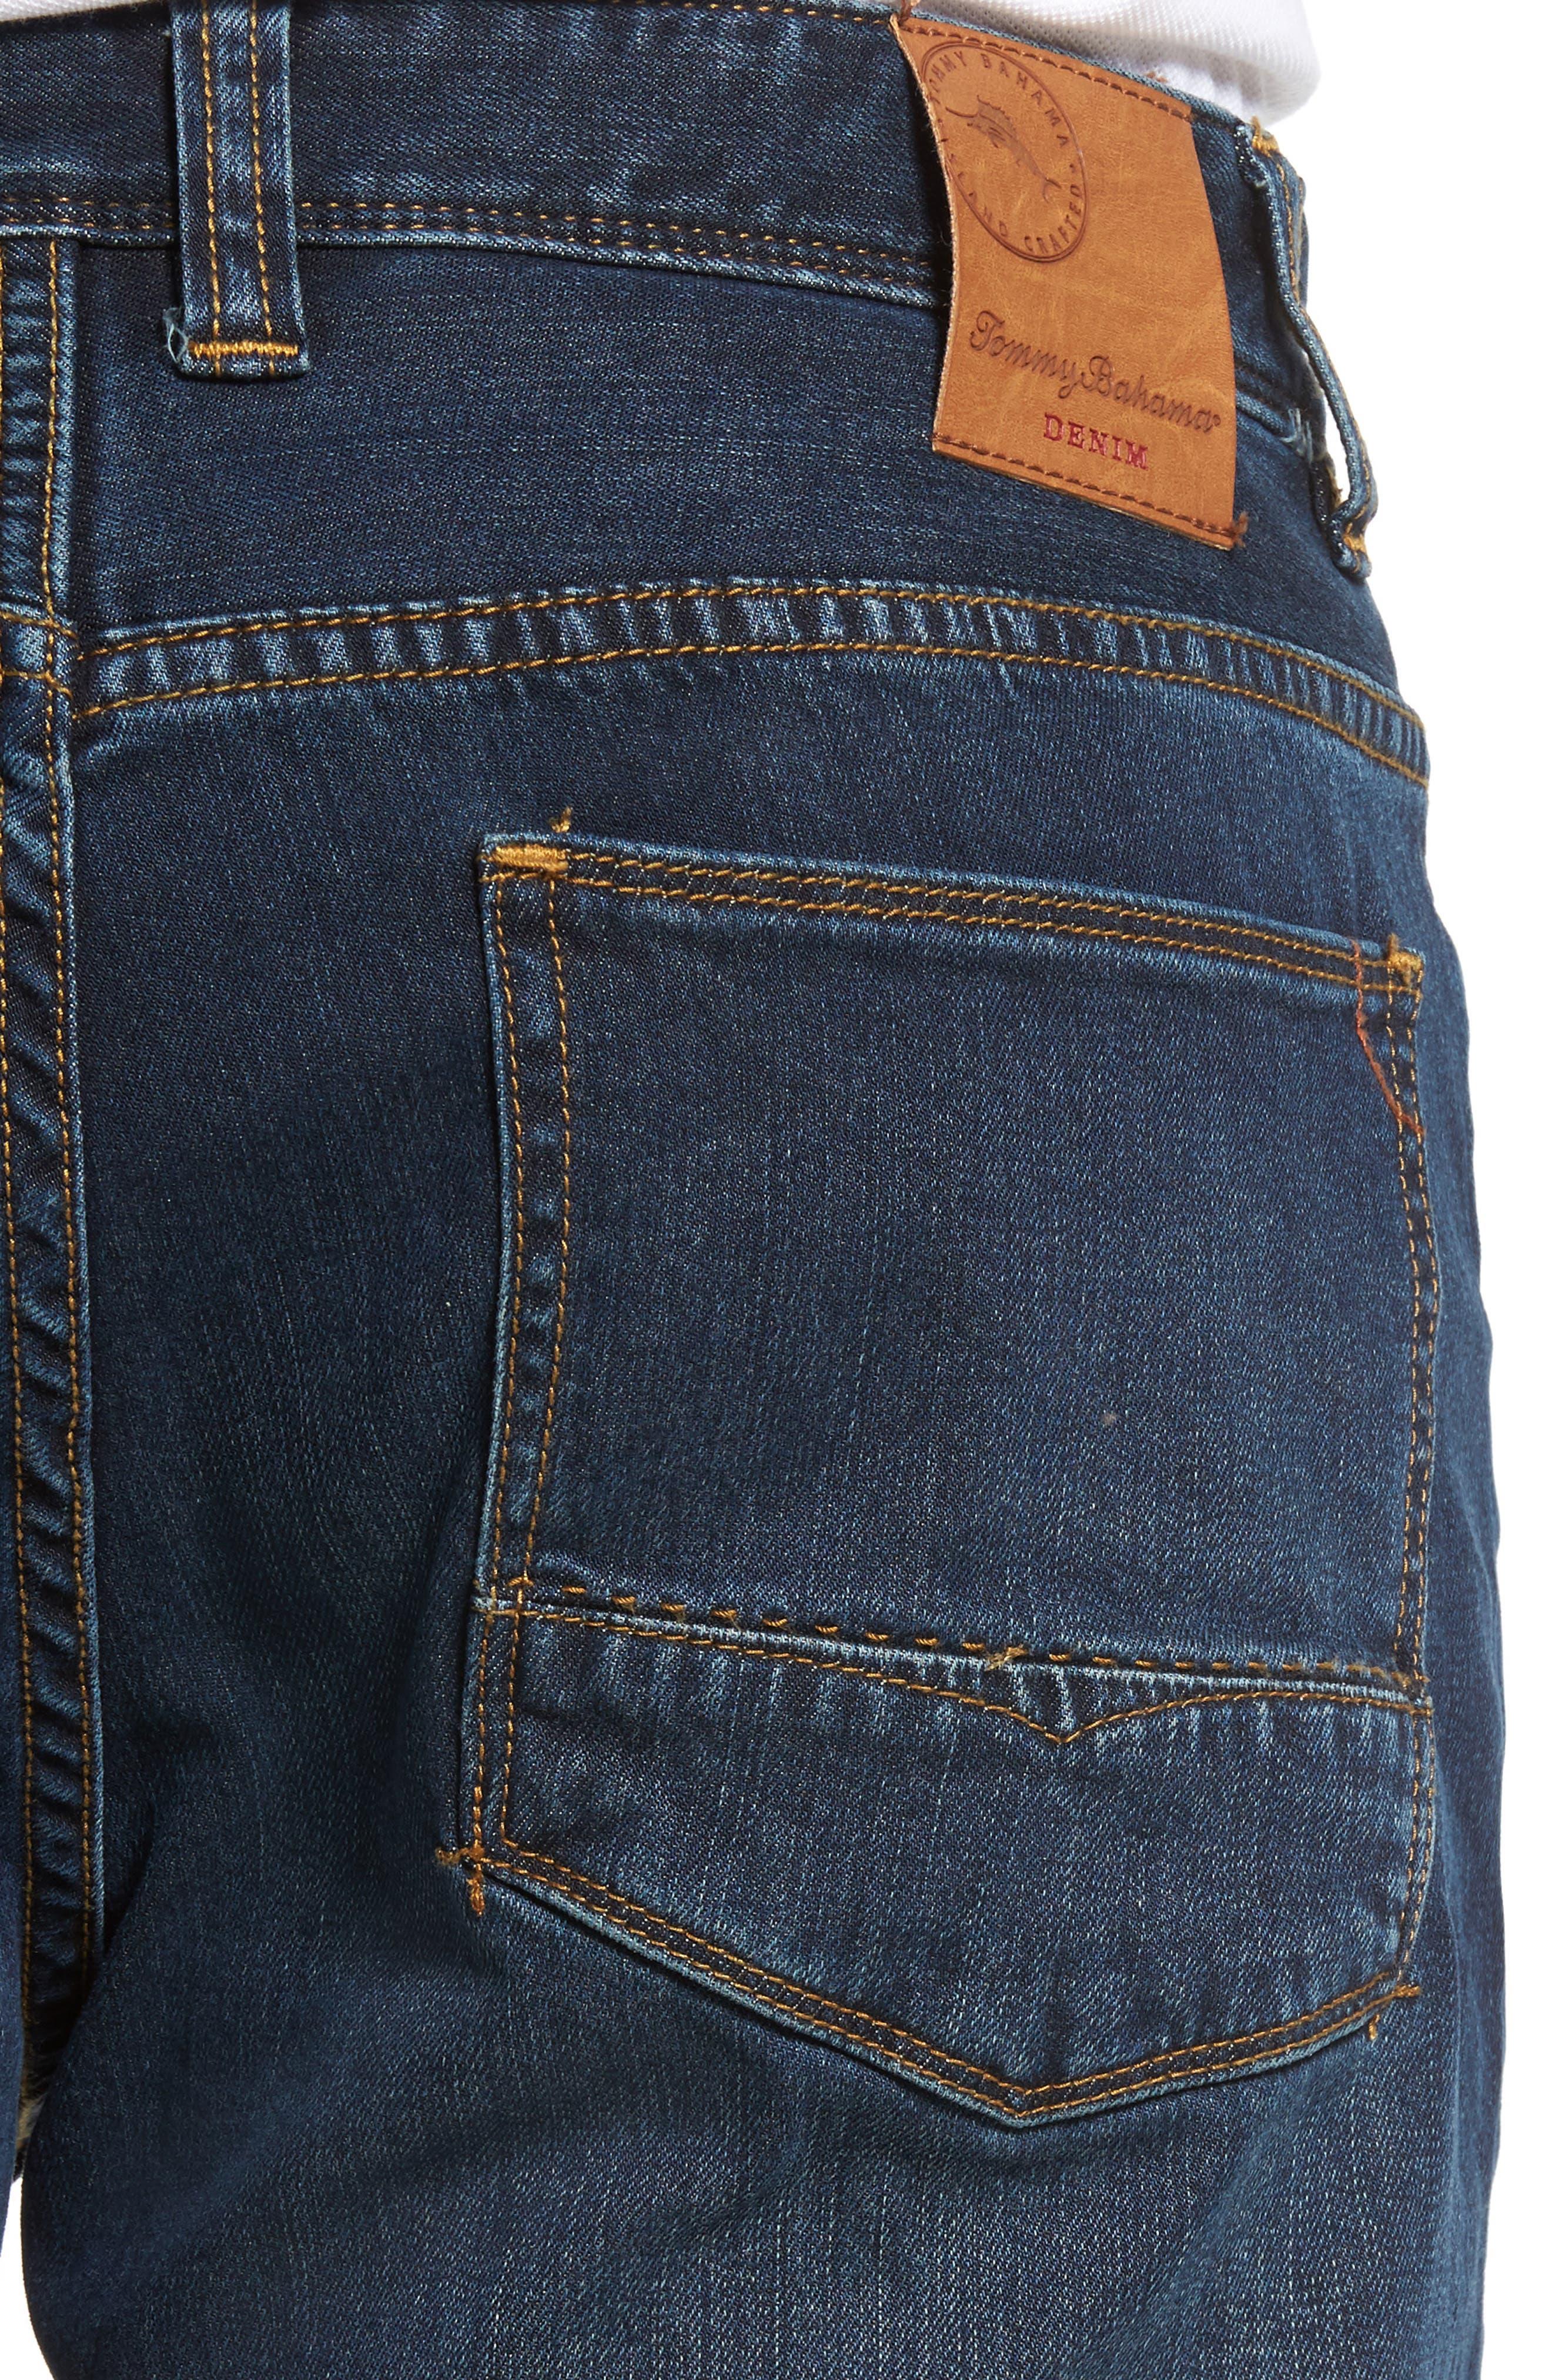 Straight Leg Jeans,                             Alternate thumbnail 4, color,                             Vintage Dark Wash